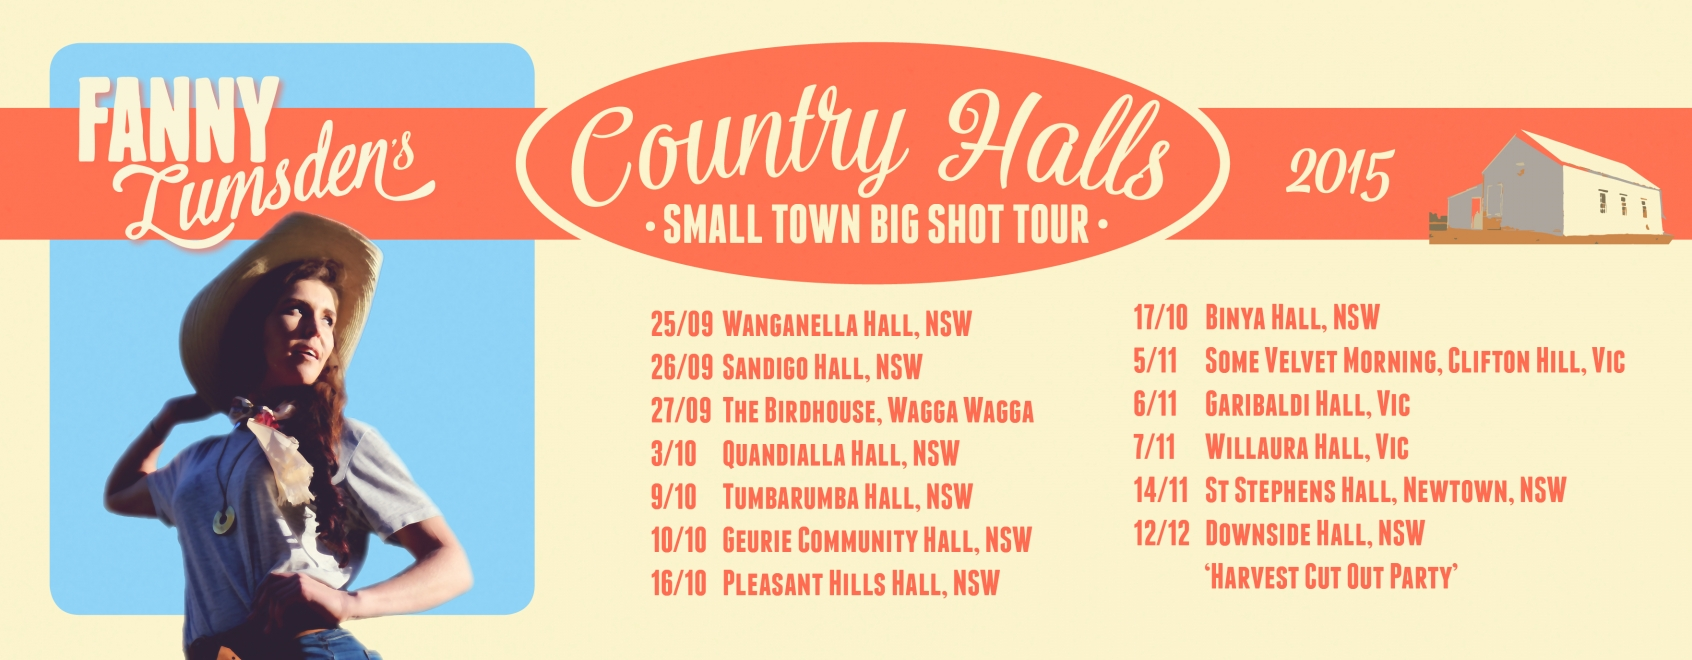 Fanny Lumsden - Country Halls Tour 2015 | Garibaldi Hall